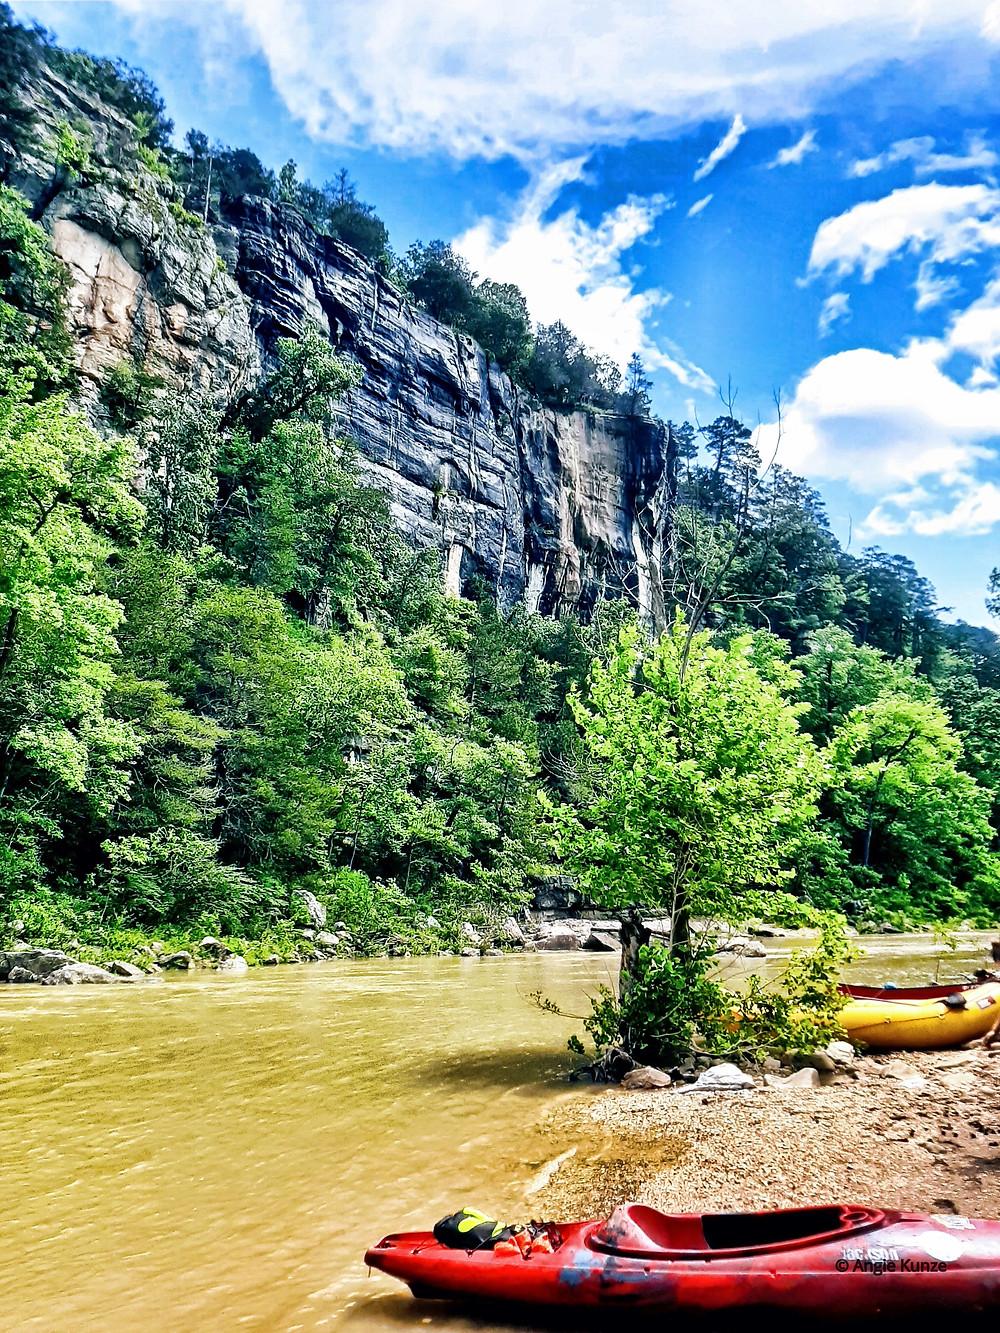 kayaking the Buffalo River in Arkansas